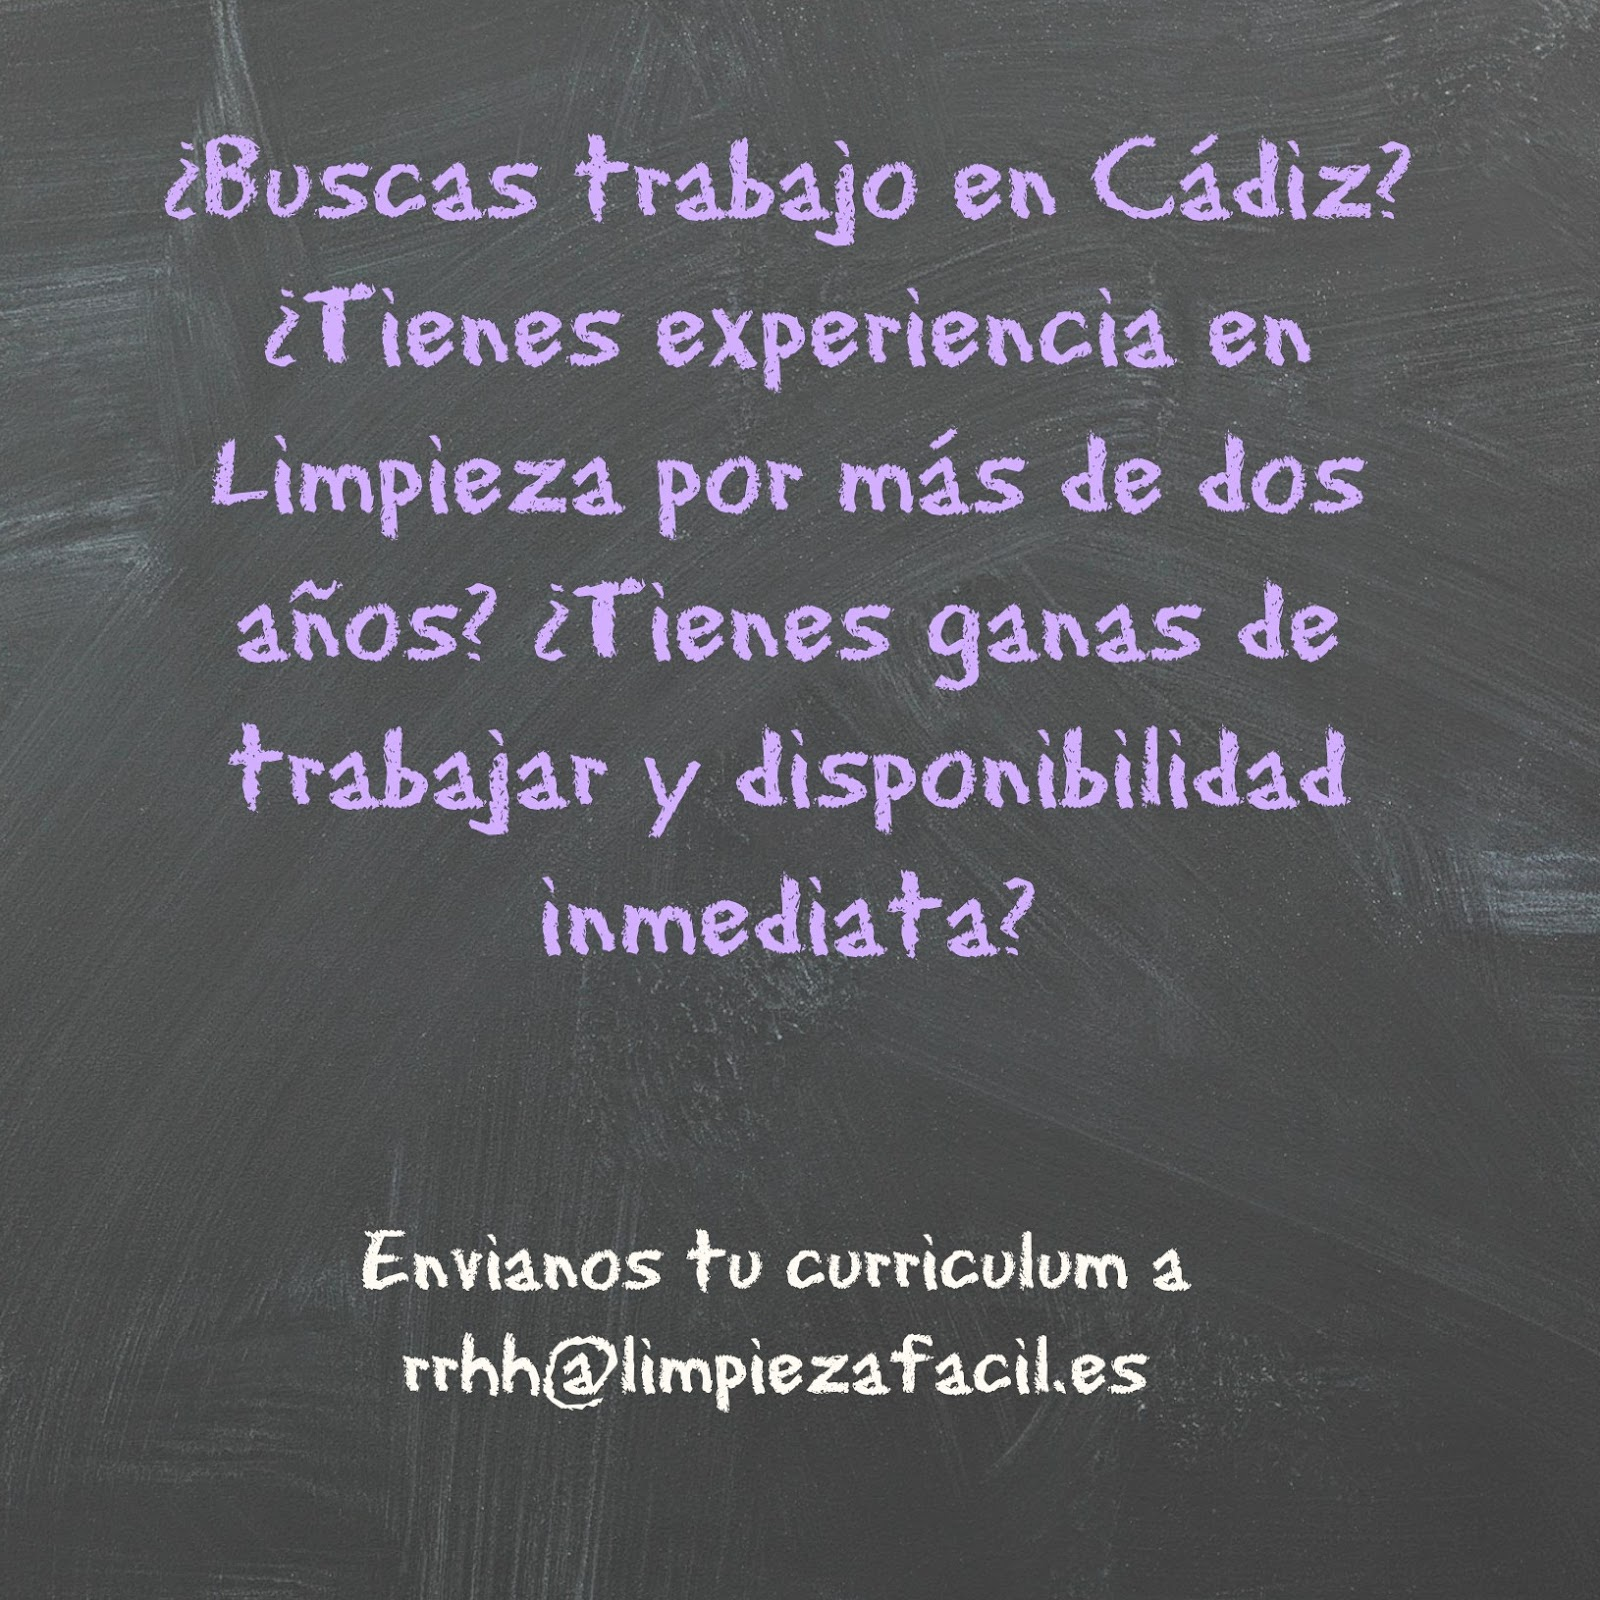 Oferta de trabajo - Limpieza en Cádiz